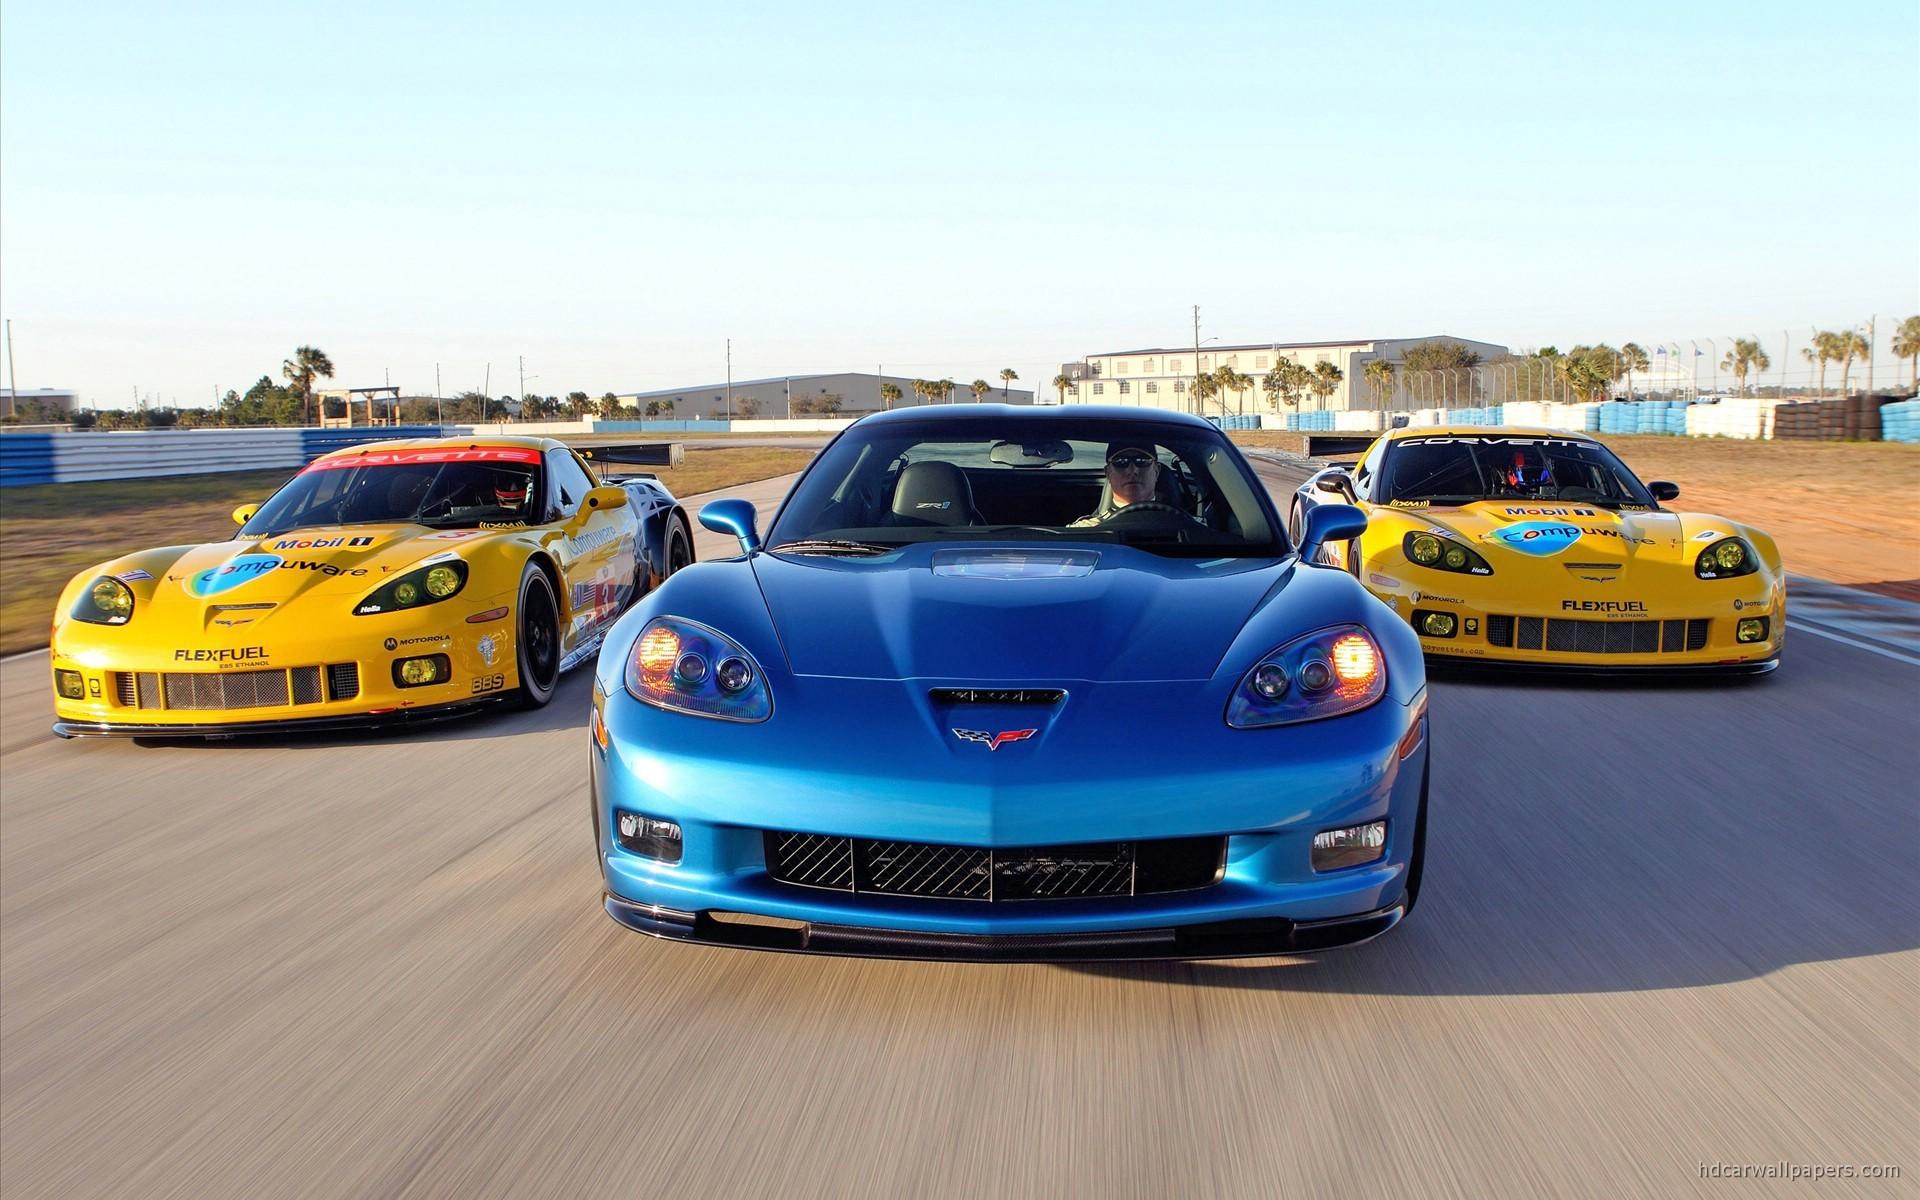 Res: 1920x1200, 2010 Corvette Racing Sebring Cars Wallpaper